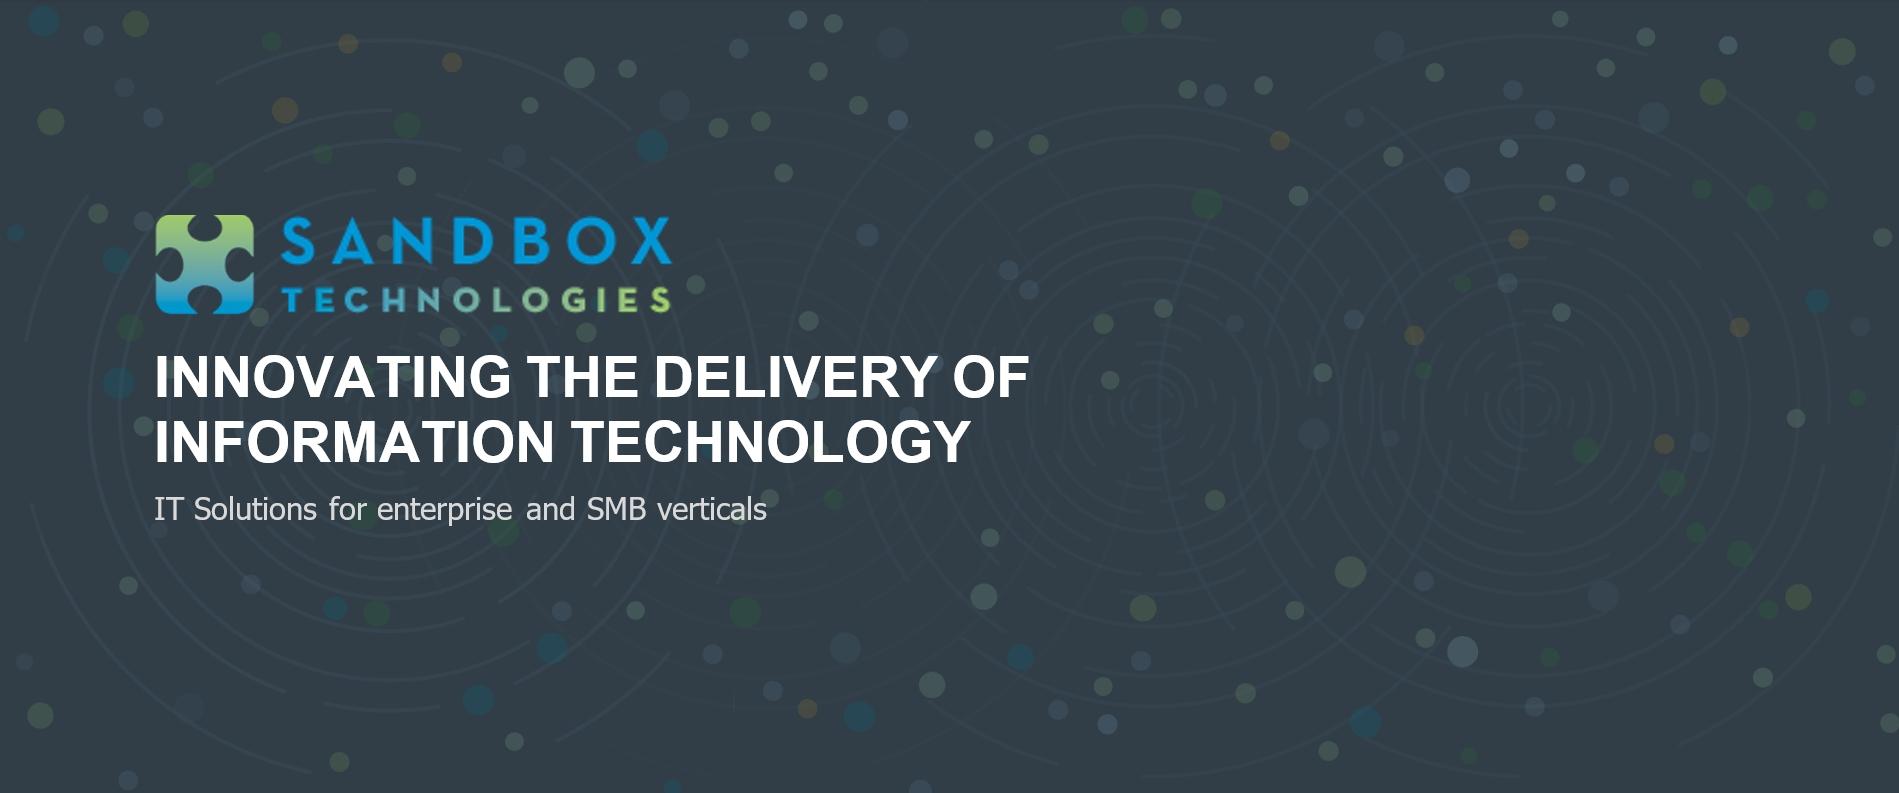 Sandbox Technologies